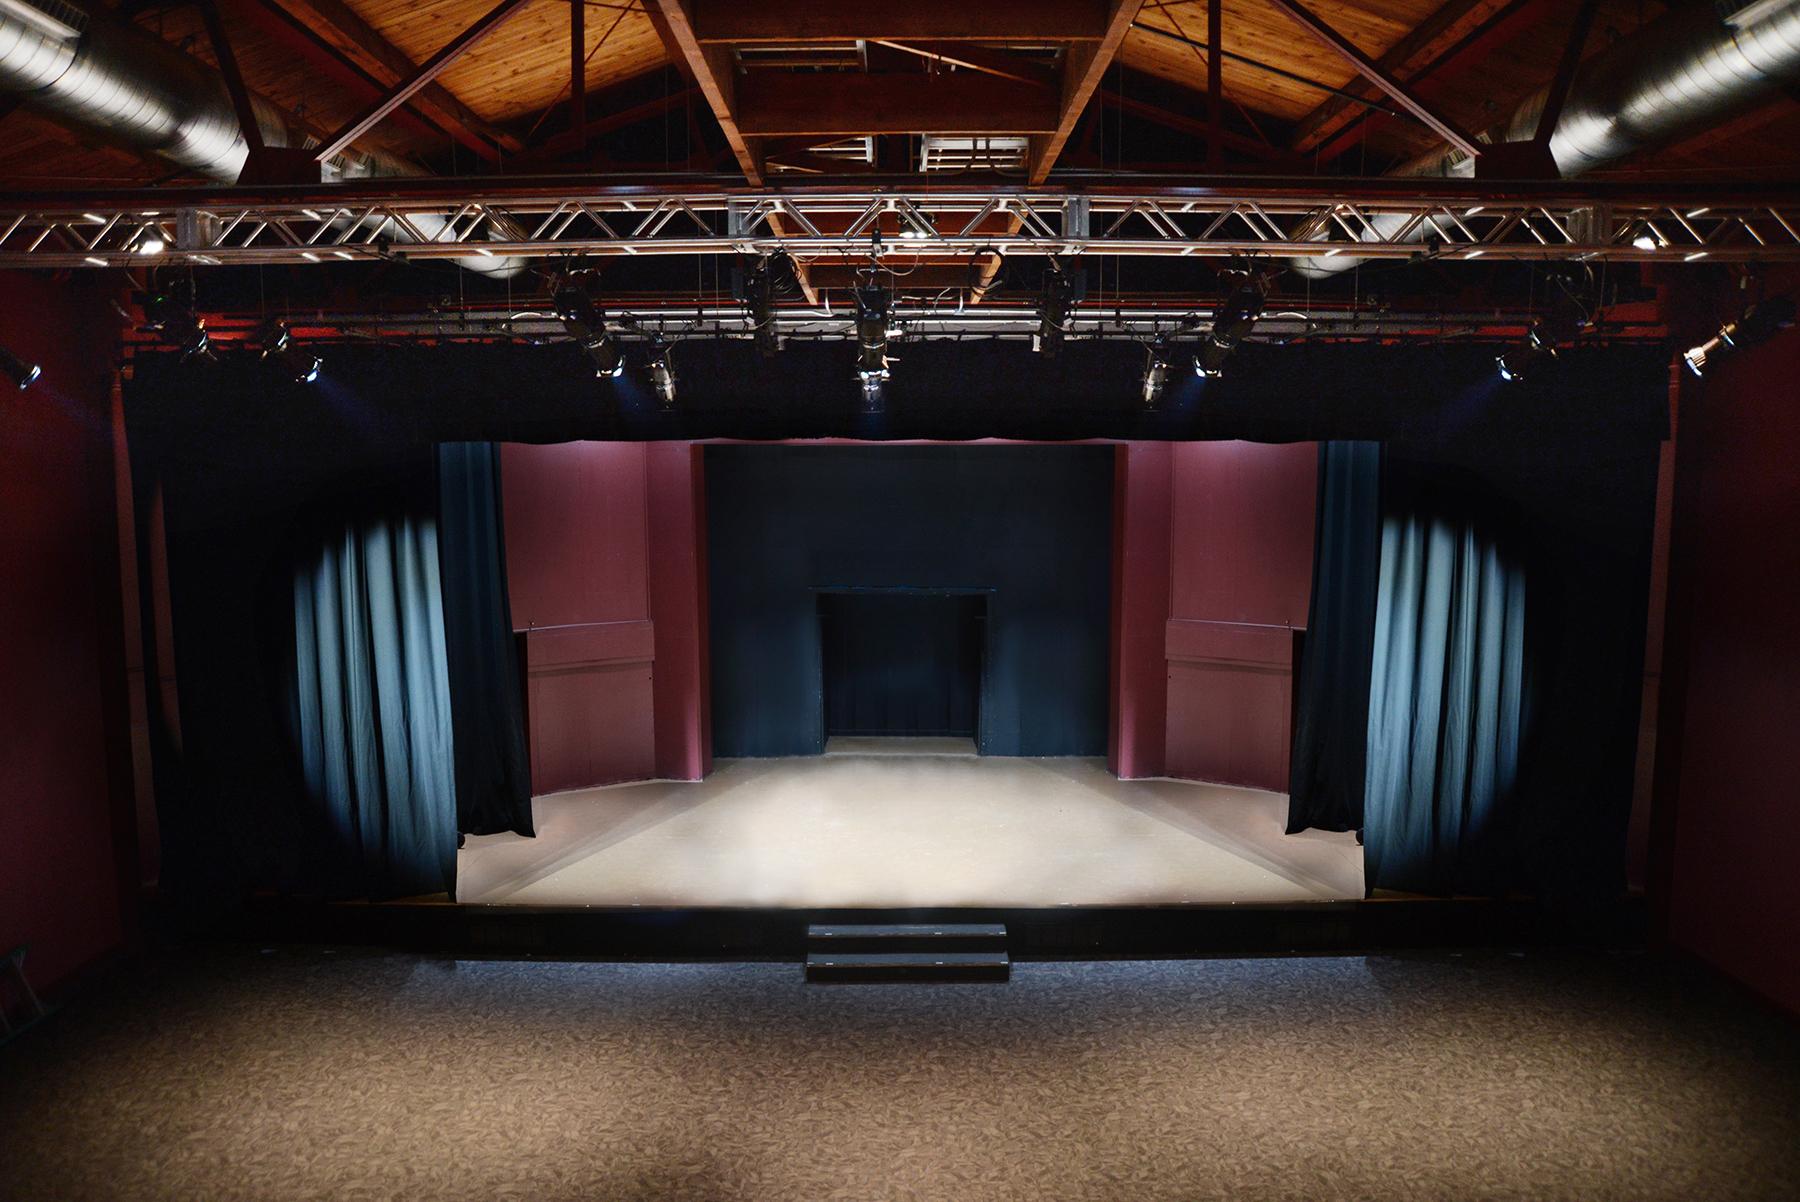 Hopewell Theater in Hopewell, NJ 08525 - ChamberofCommerce.com